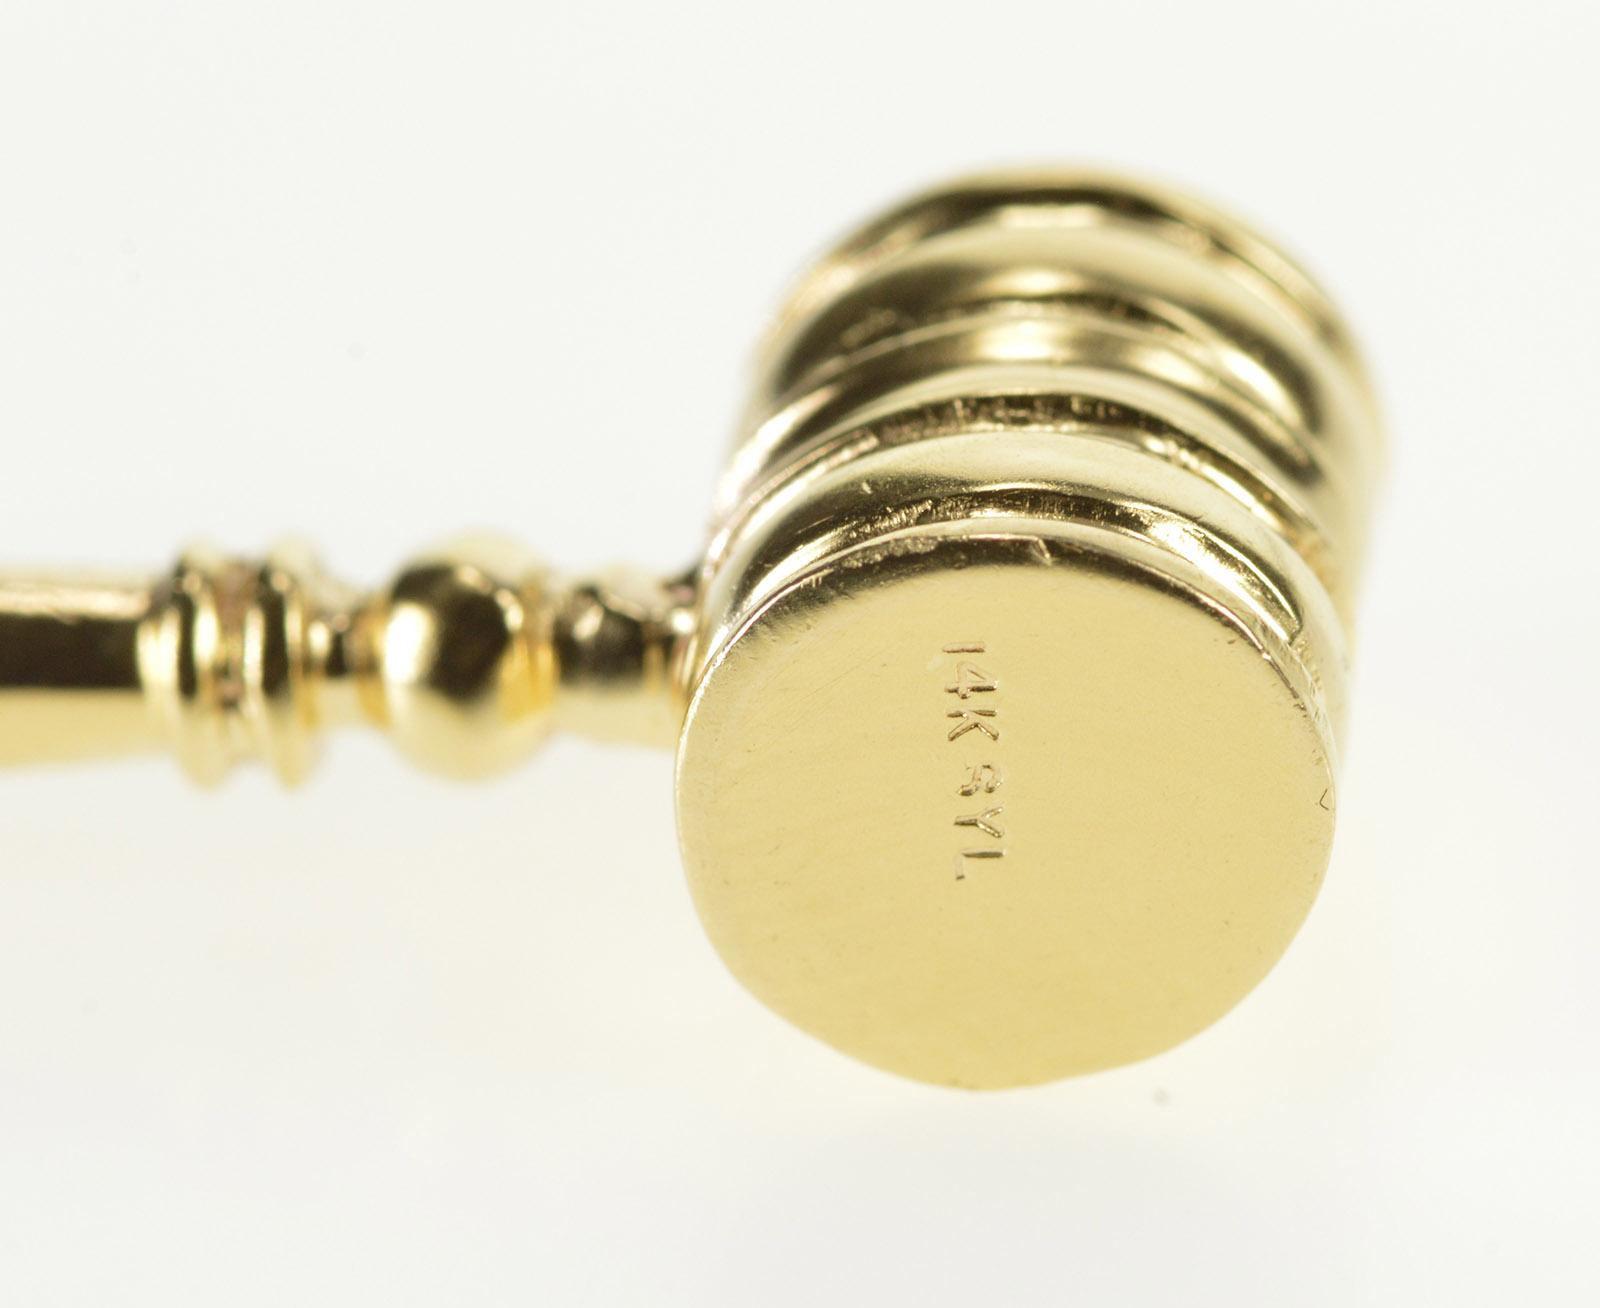 14K Yellow Gold 3D Gavel Charm Judge Court Jewelry